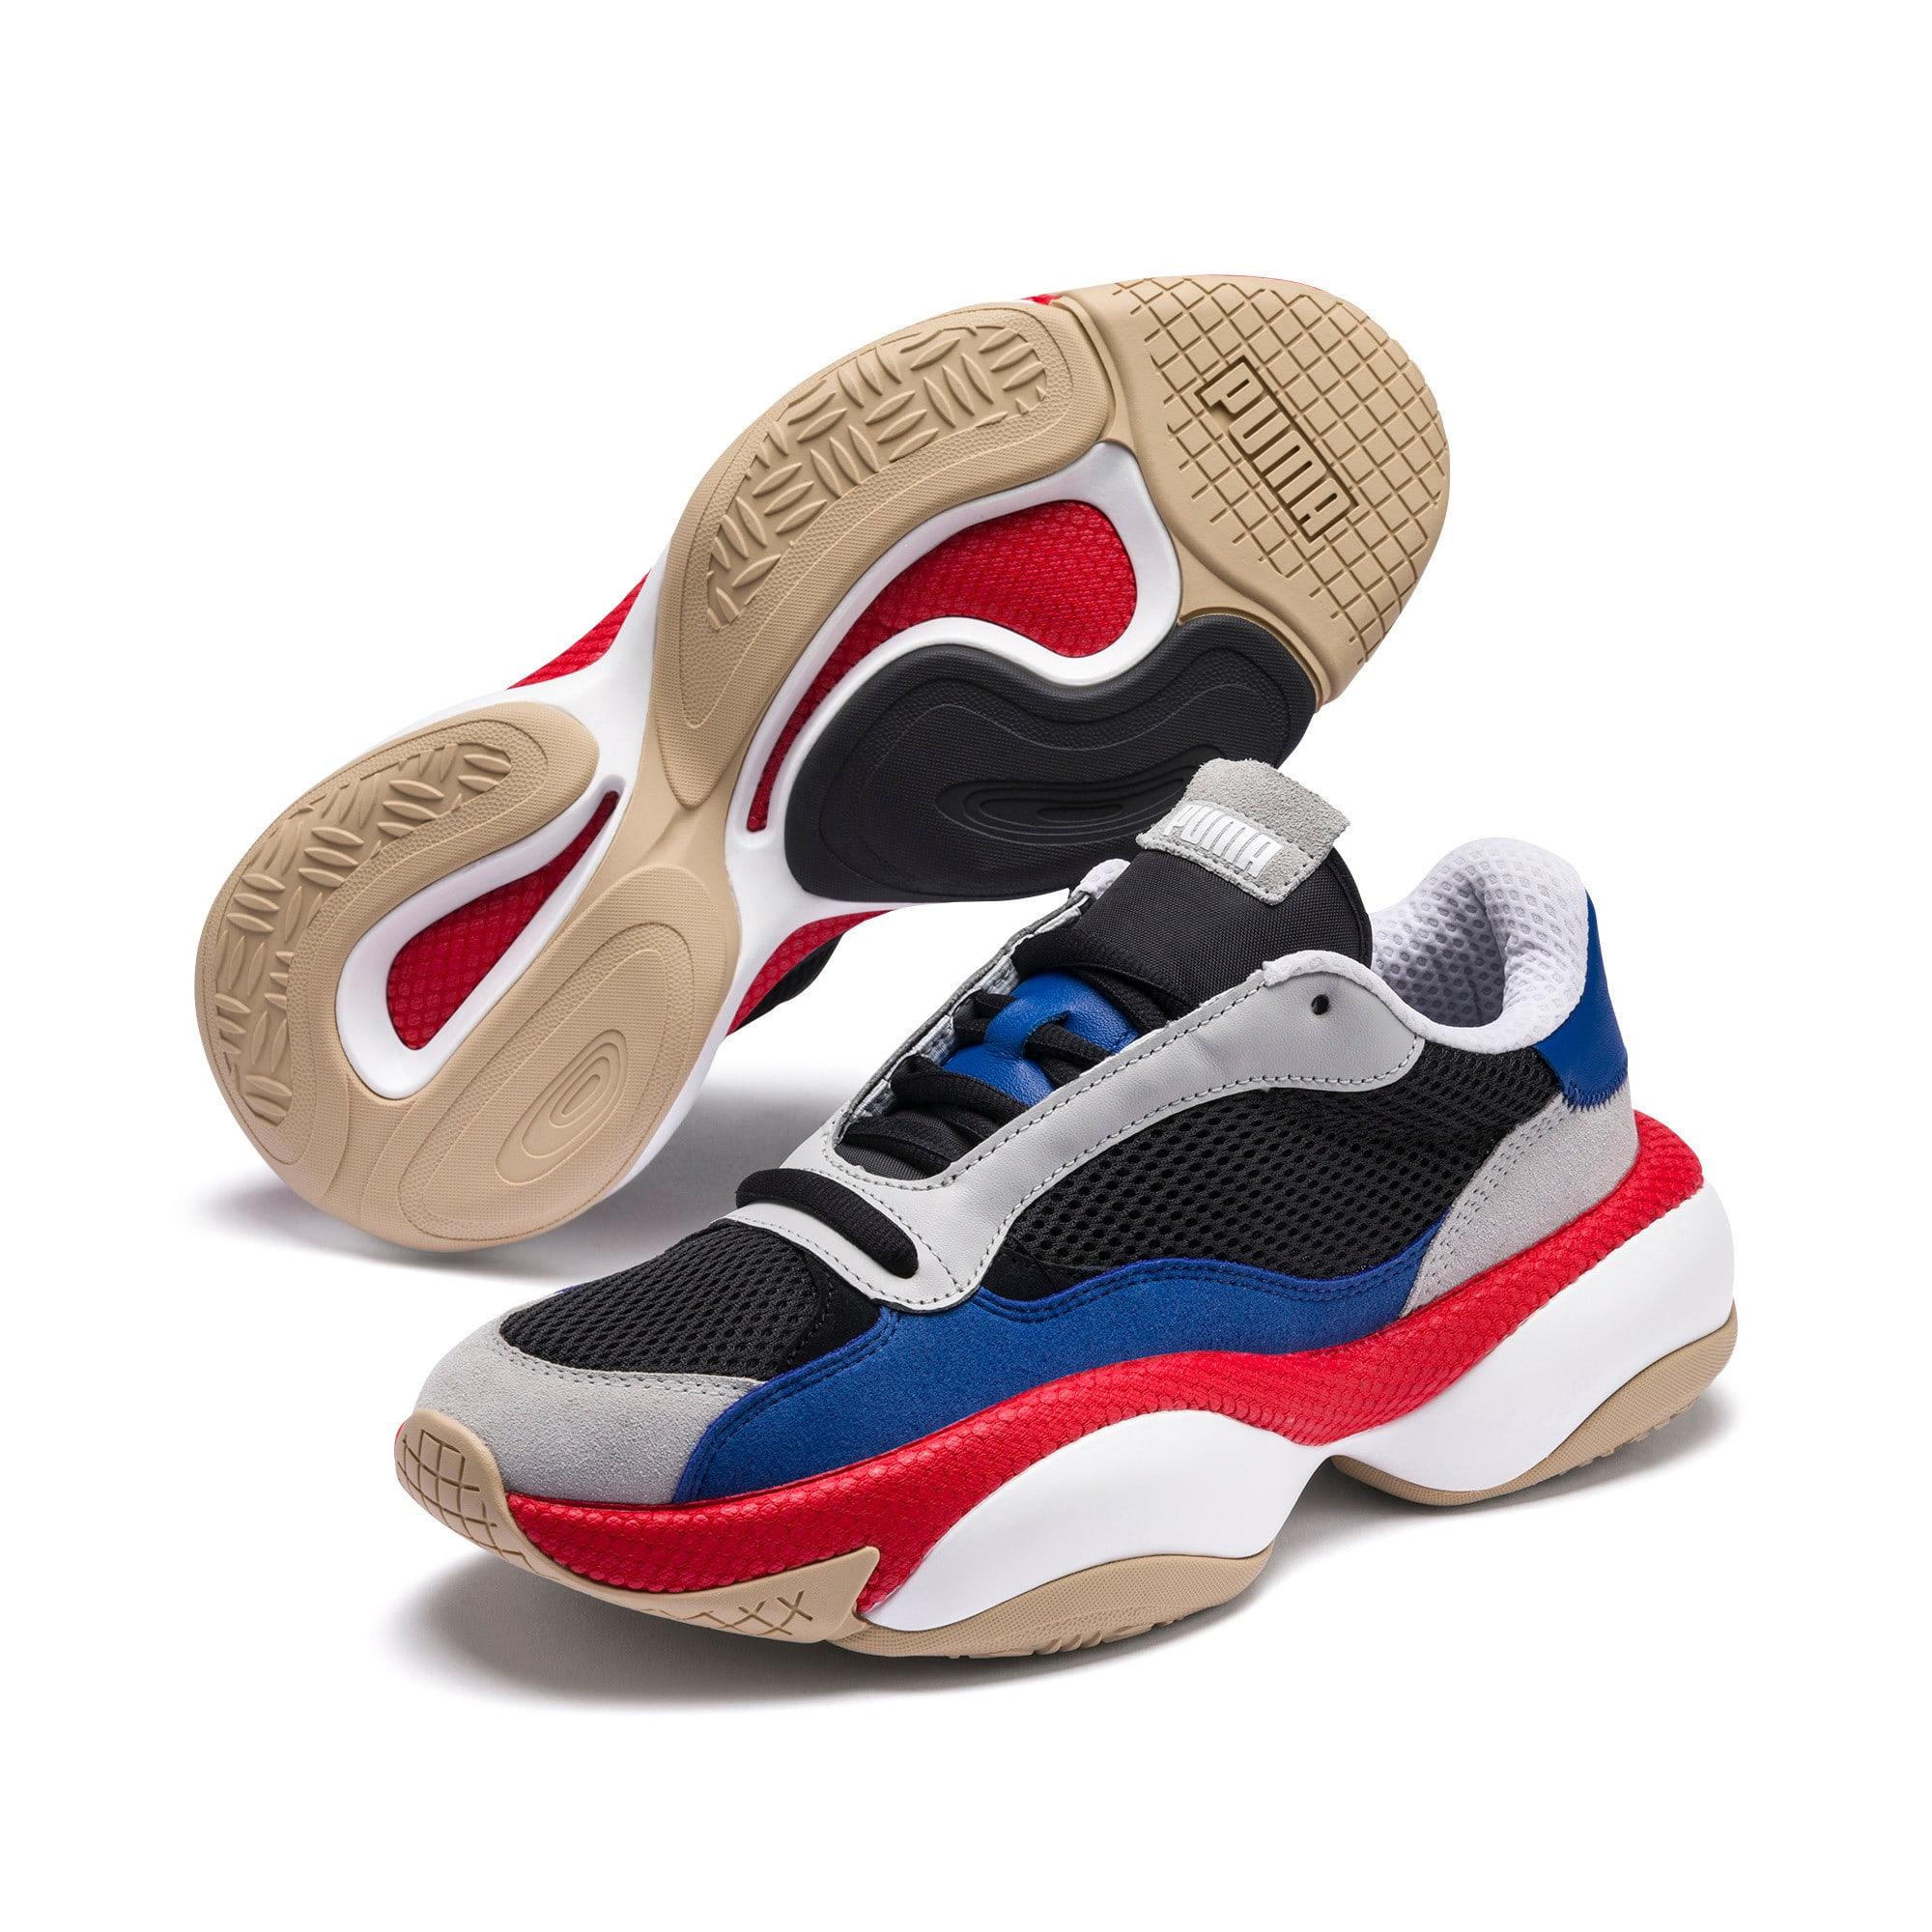 Thumbnail 7 of Alteration Kurve Sneakers, High Rise-Puma Black, medium